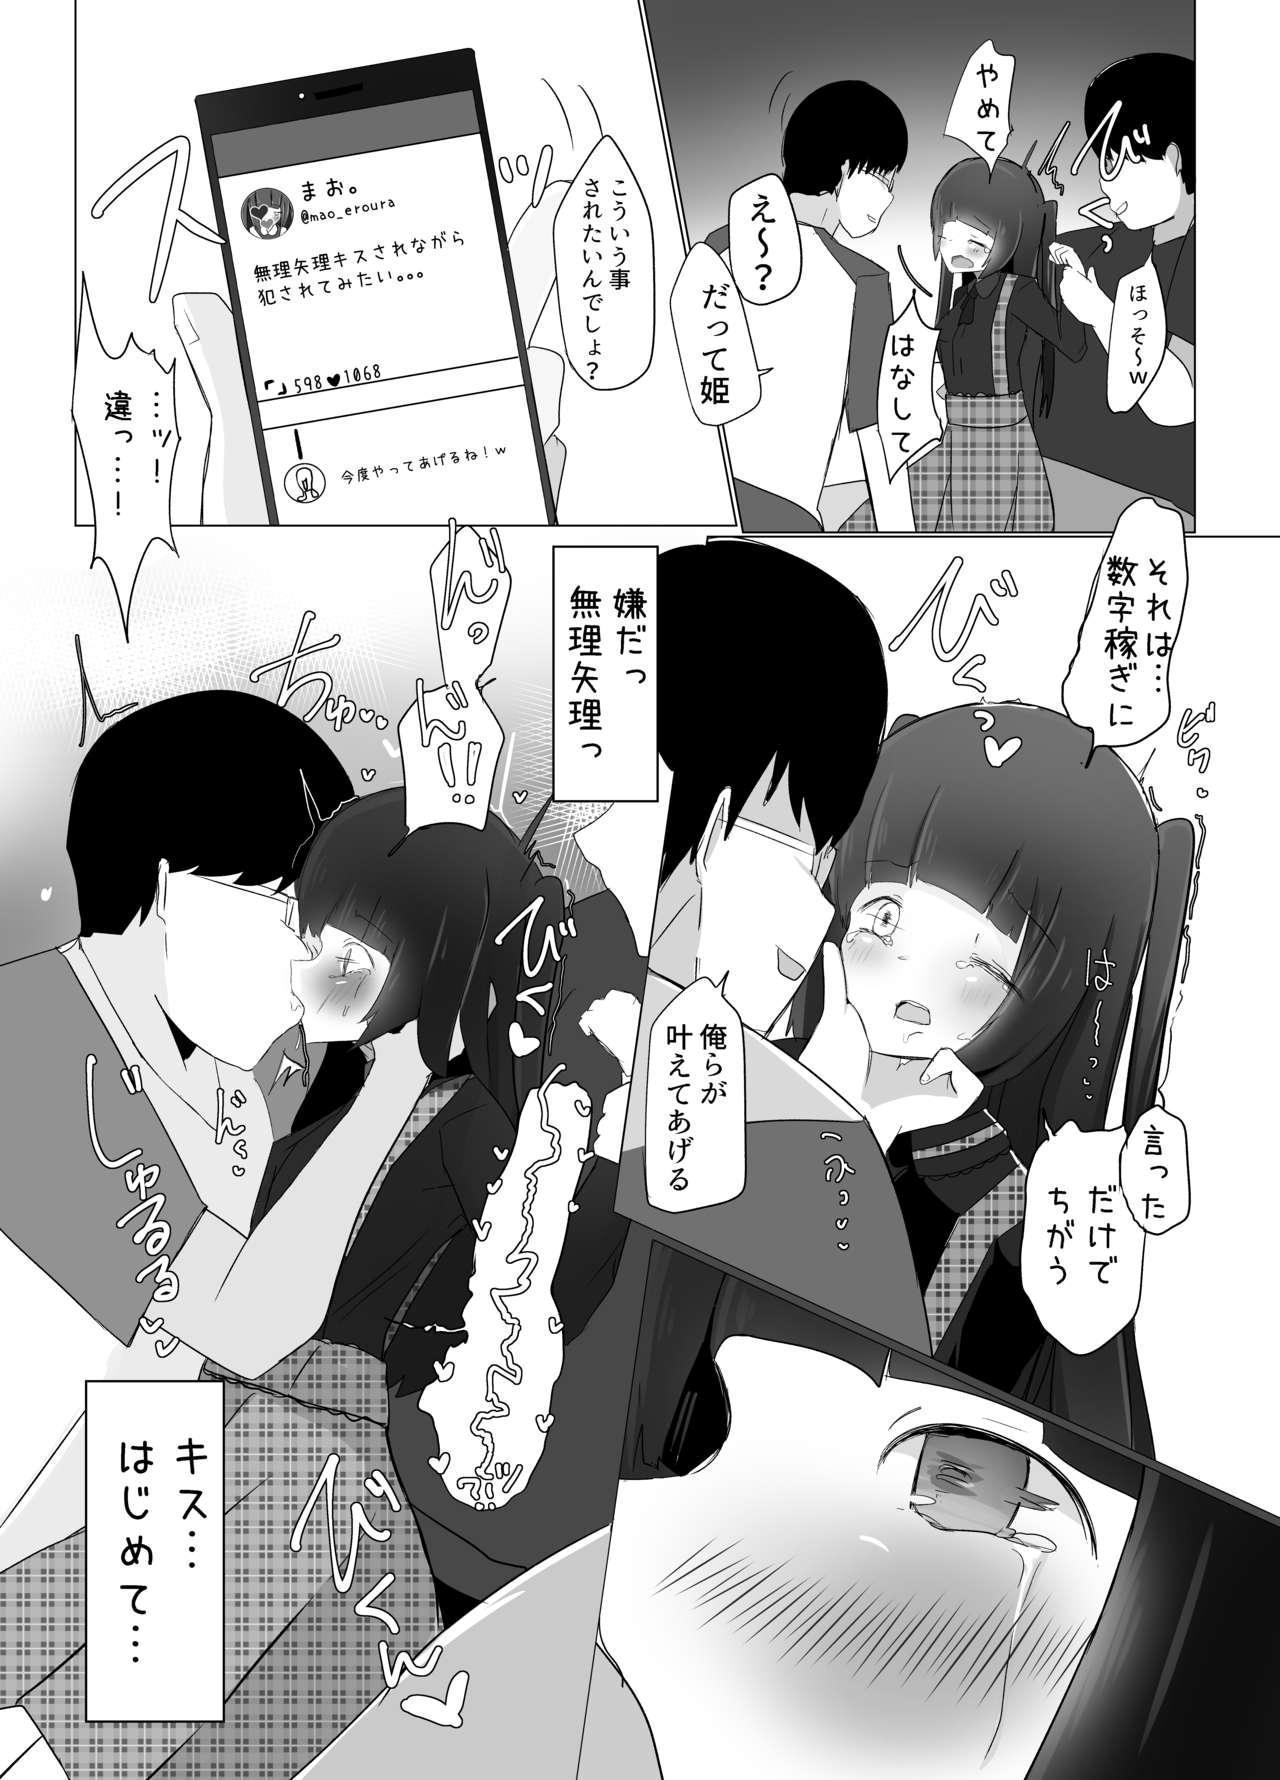 TS Hime wa Okasaretai. 7